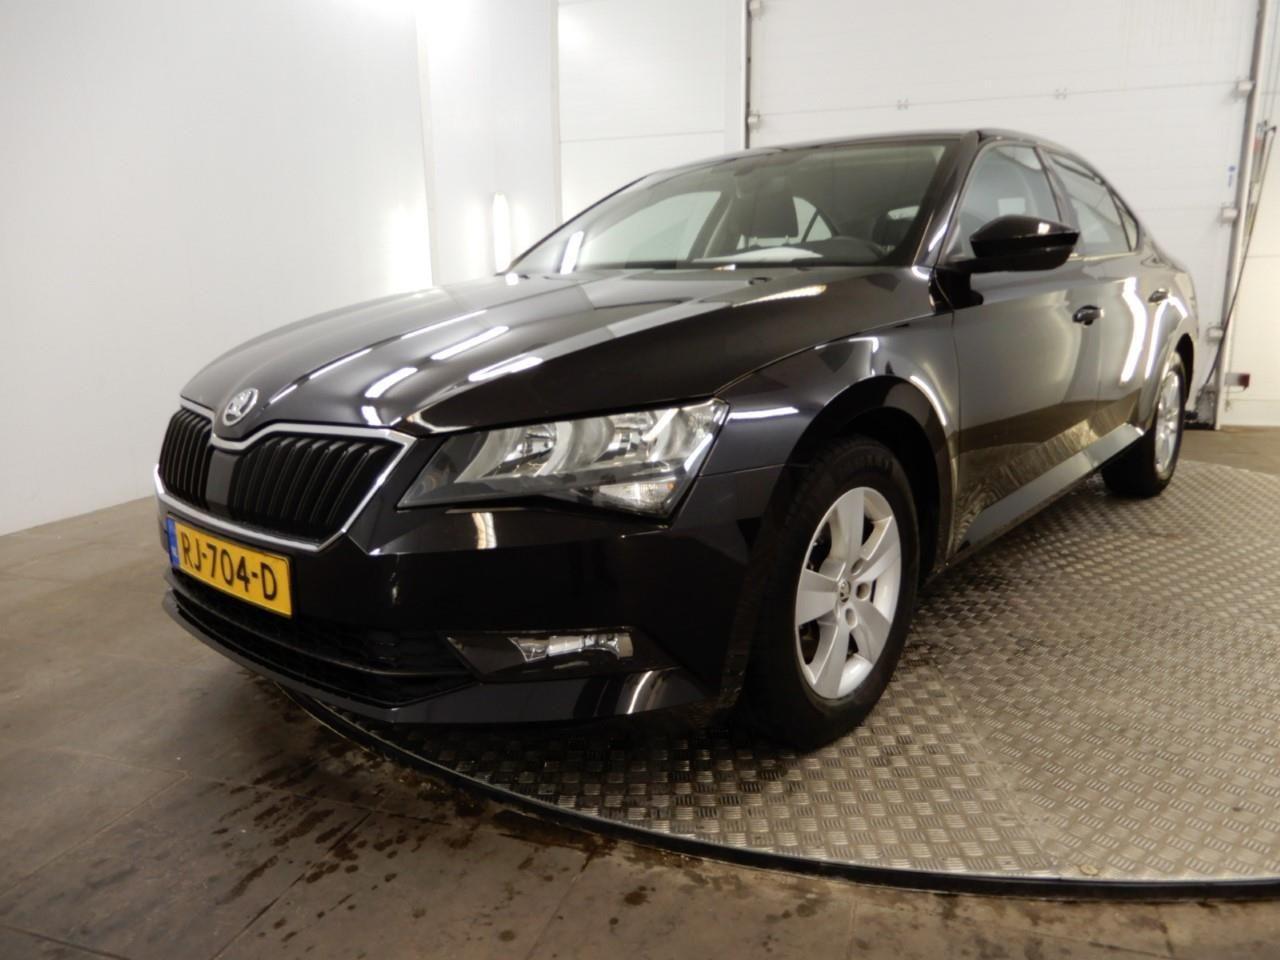 Škoda Superb 1.6 tdi active business *navi+ecc+pdc+cruise*